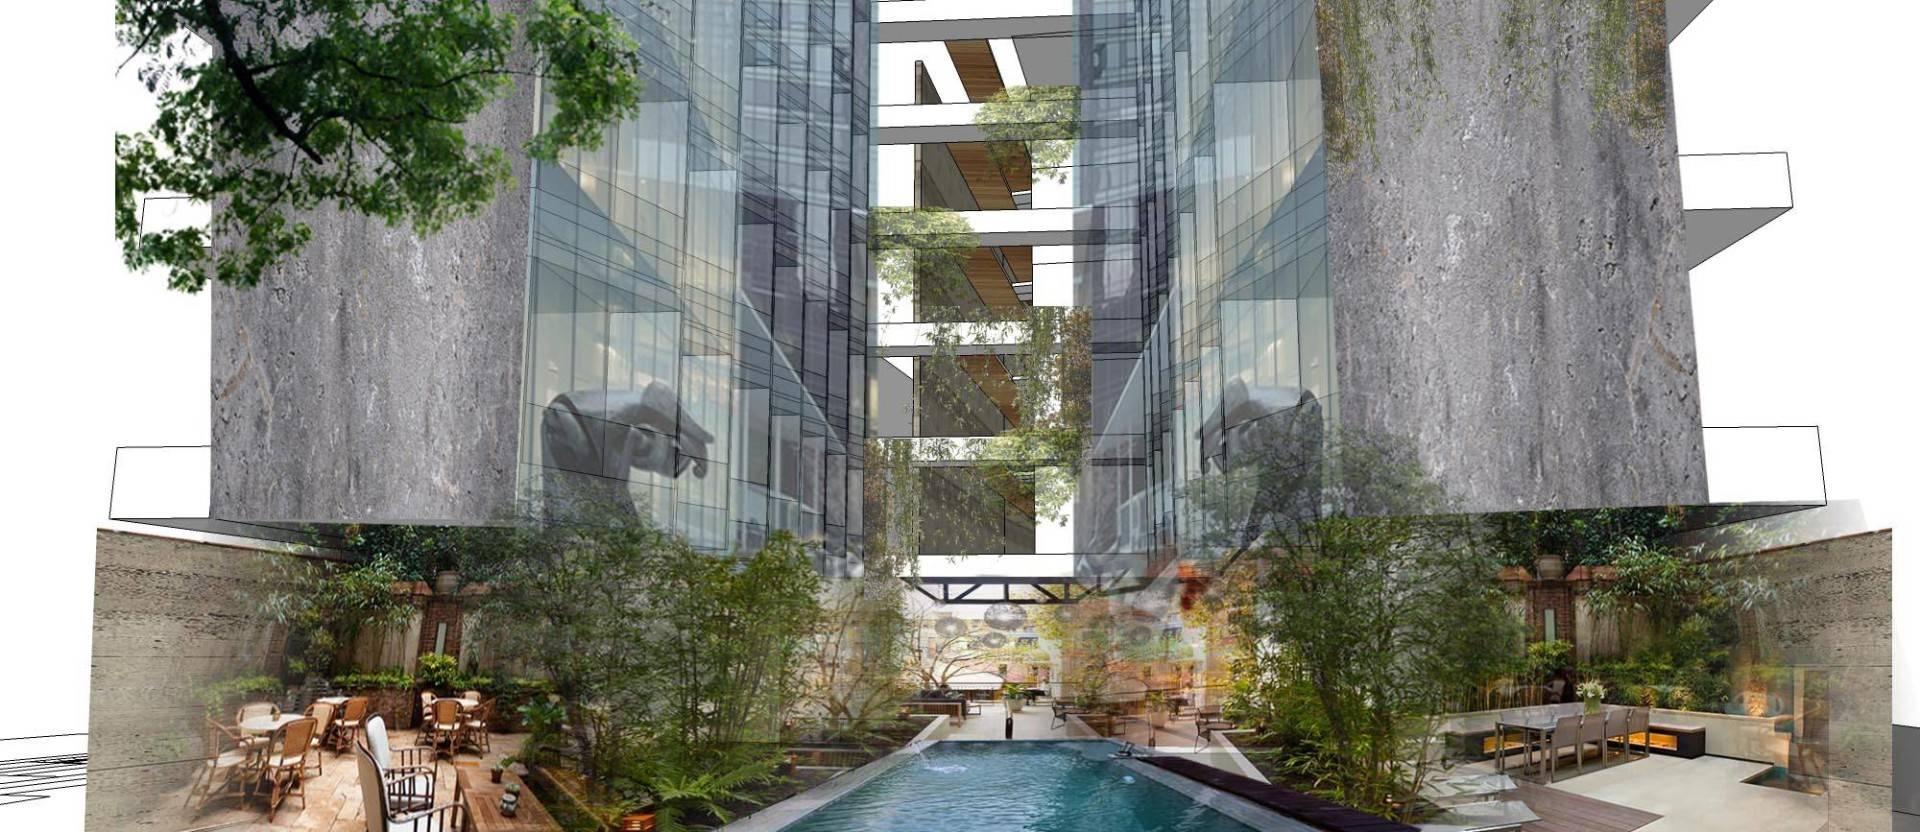 Monokroma Architect Hotel Lebak Bulus Lebak Bulus, Jakarta Lebak Bulus, Jakarta Swimming Pool Tropis  6226